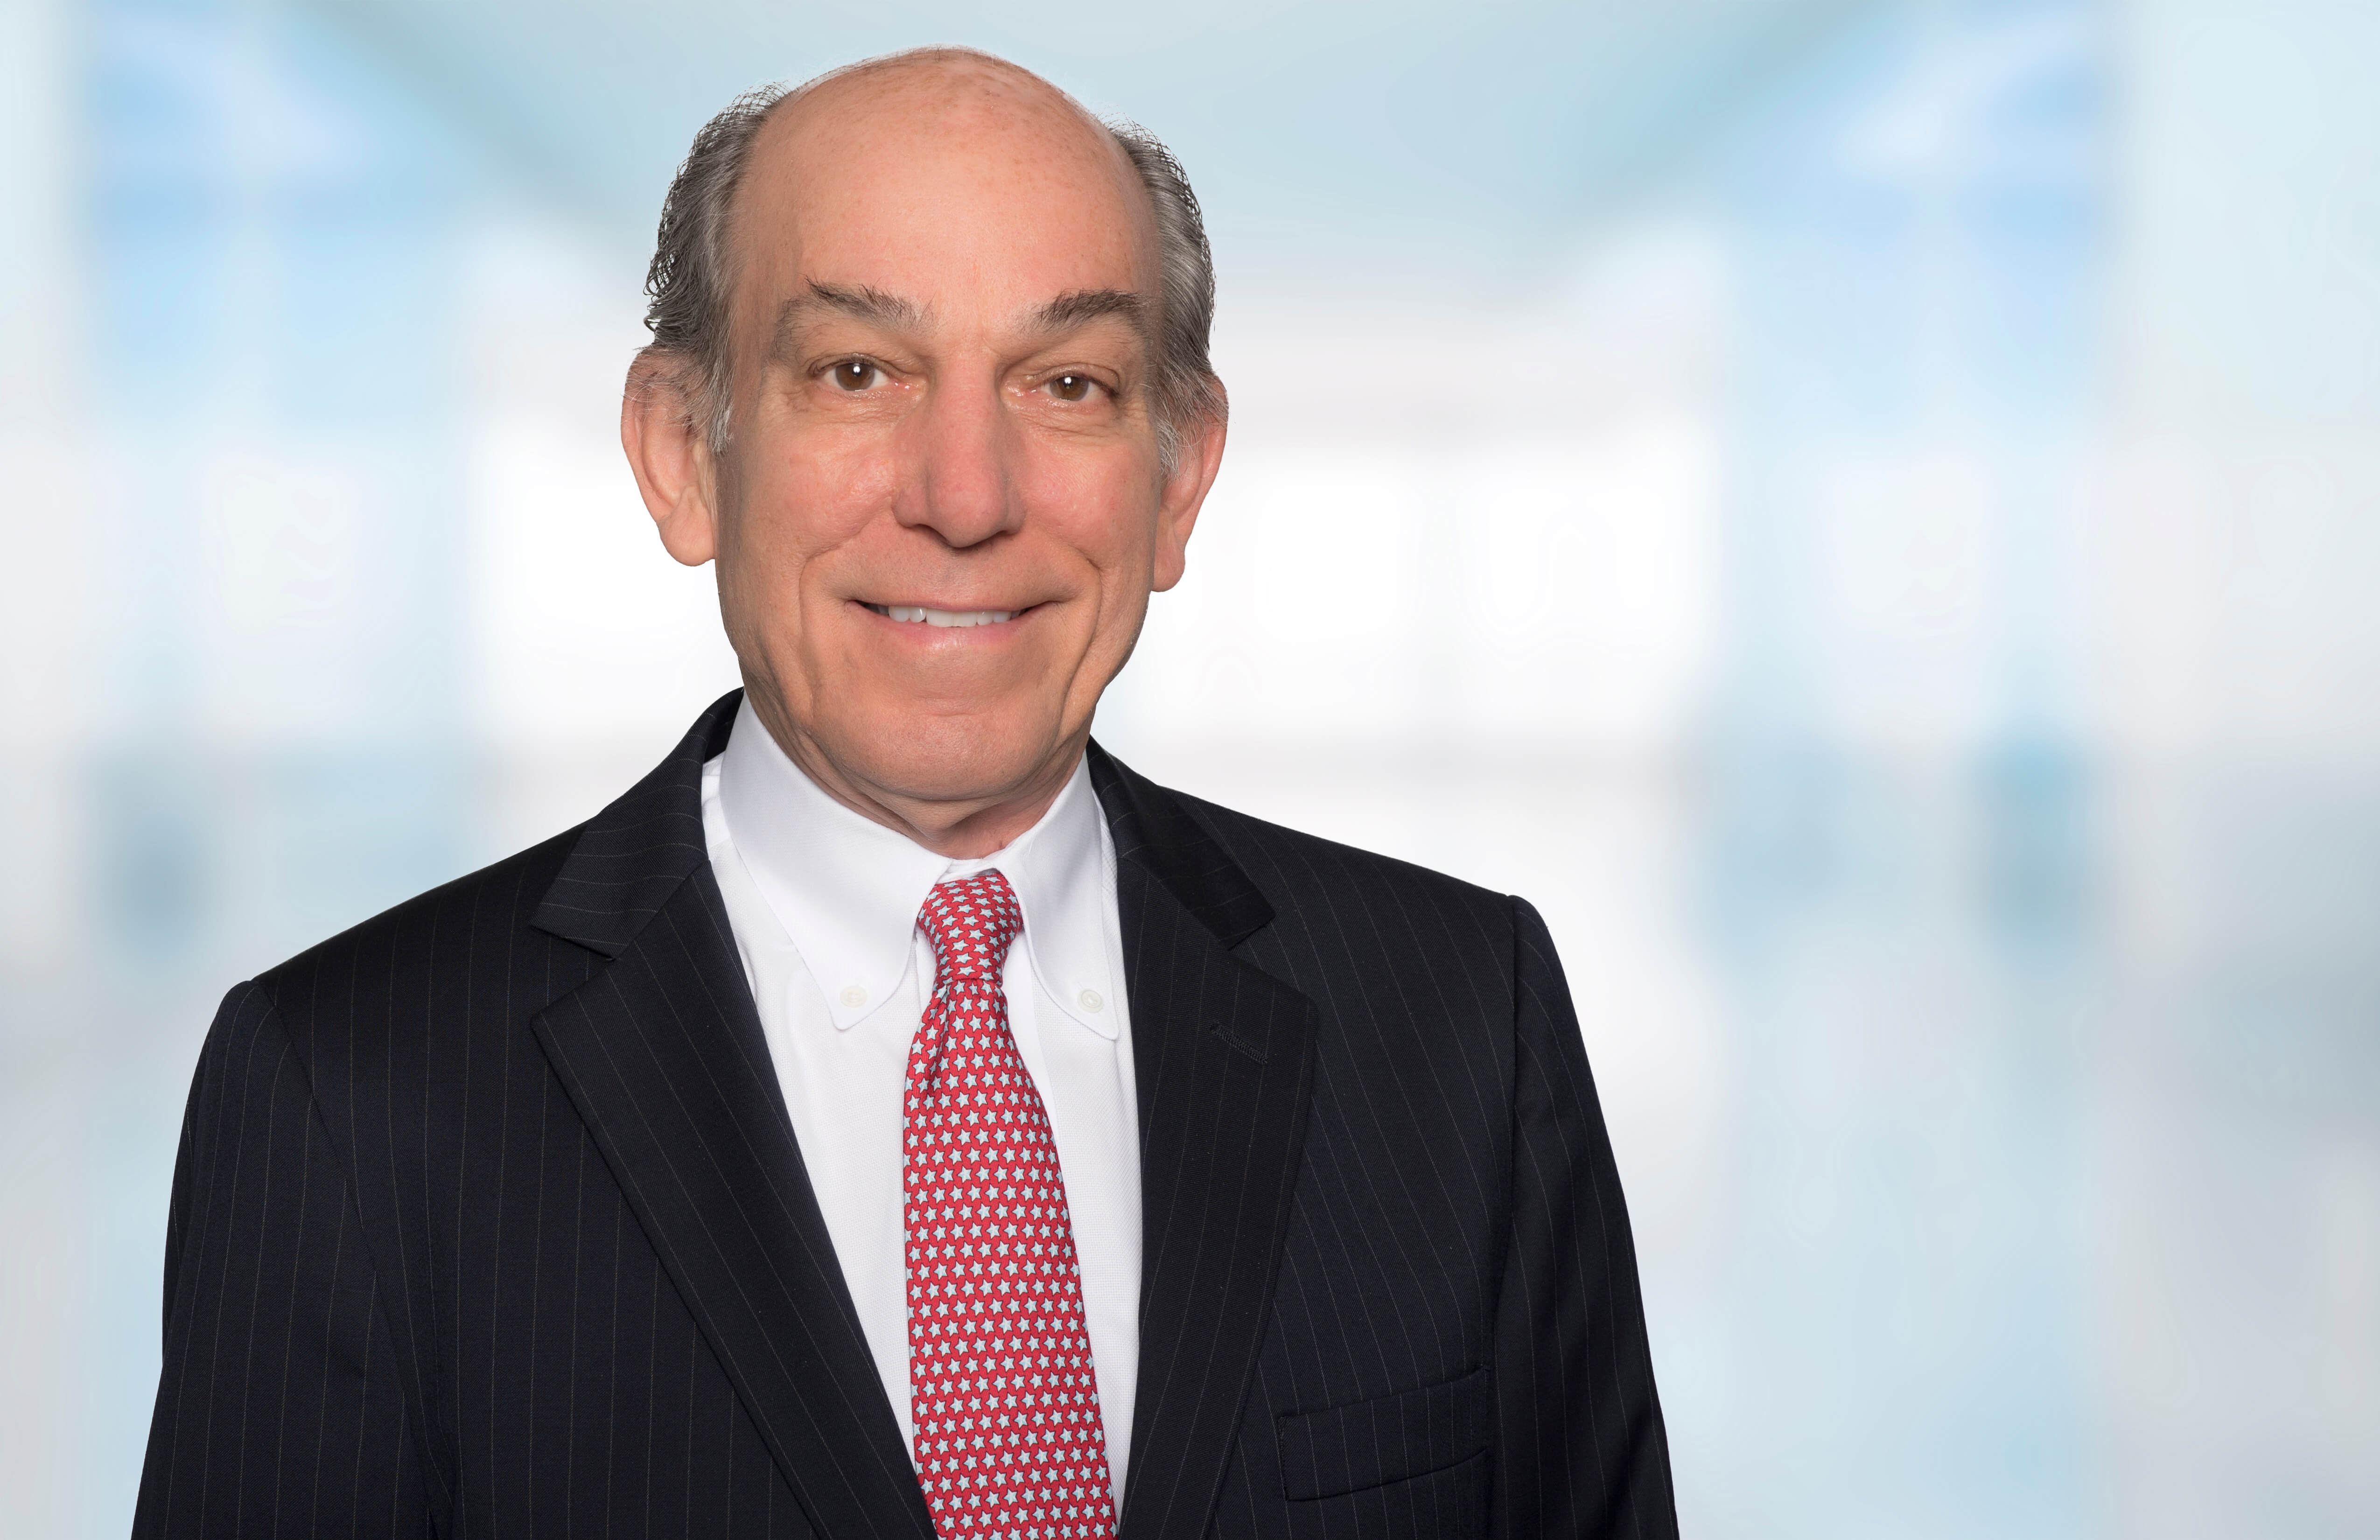 Gerald E. Bisbee, Jr